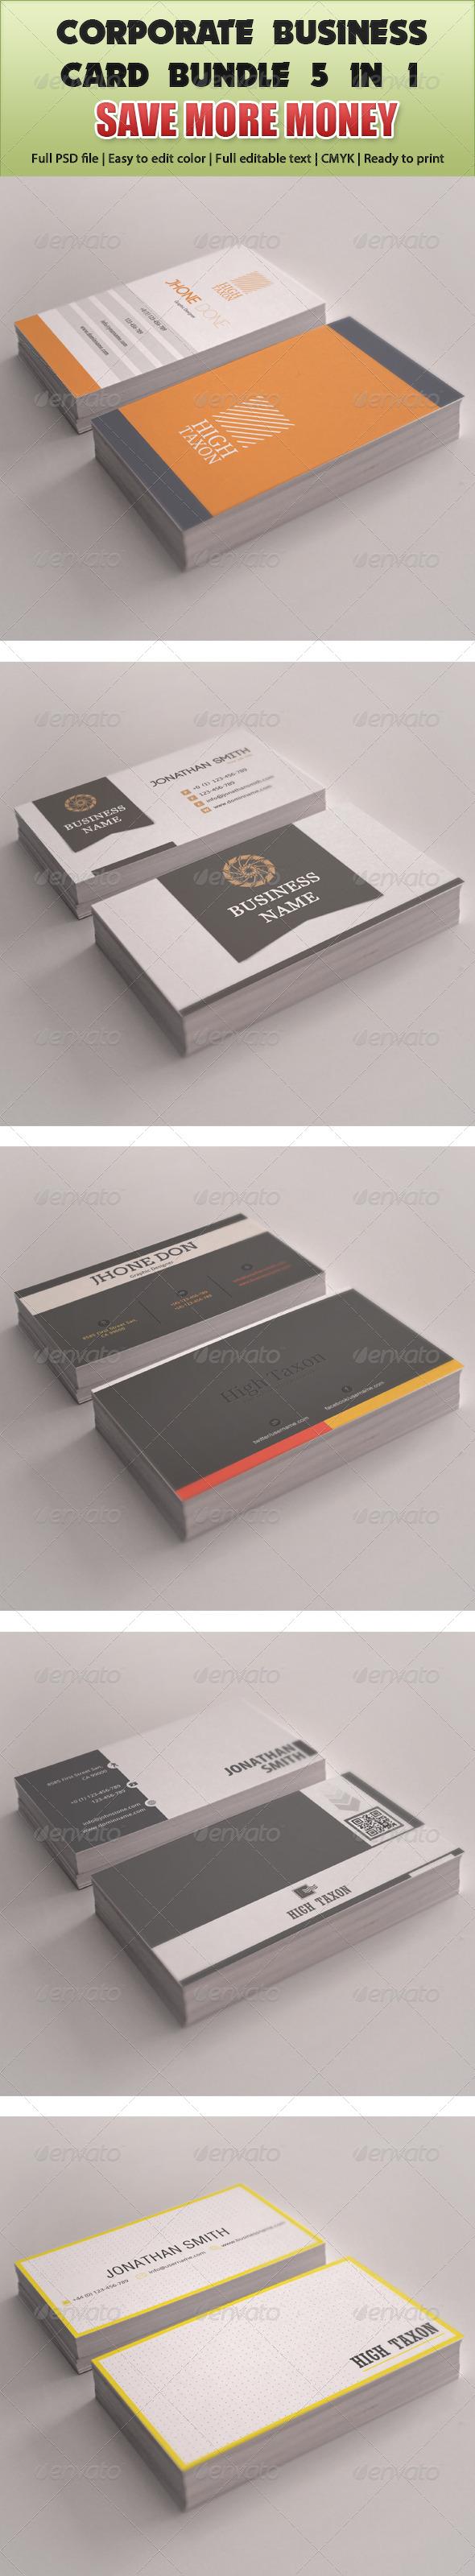 Corporate Business Card Mega Bundle 5 in 1 - Corporate Business Cards